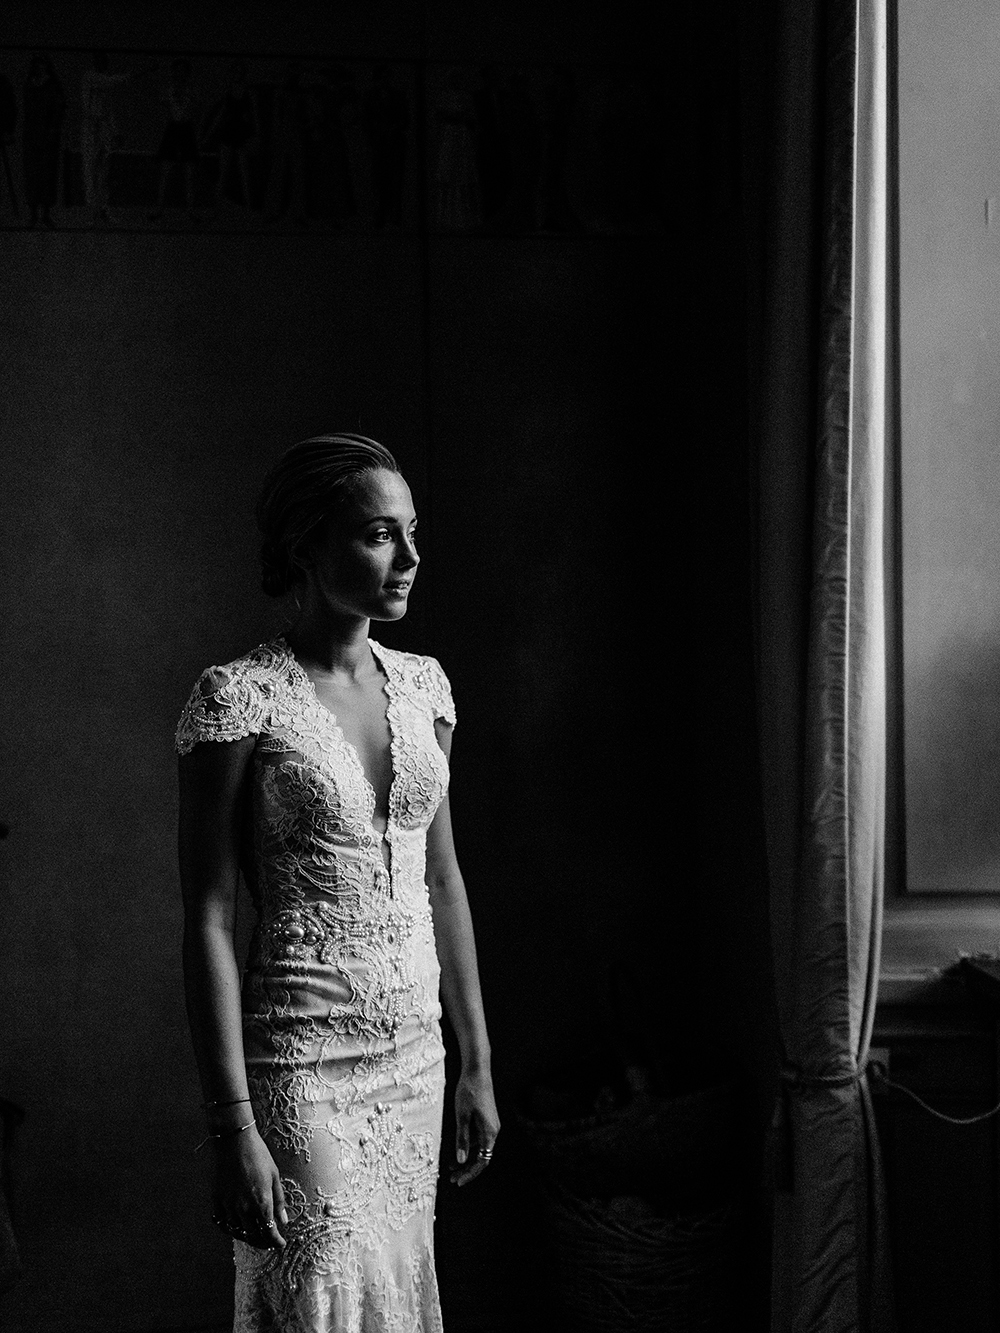 Westhem huwelijksfotograaf